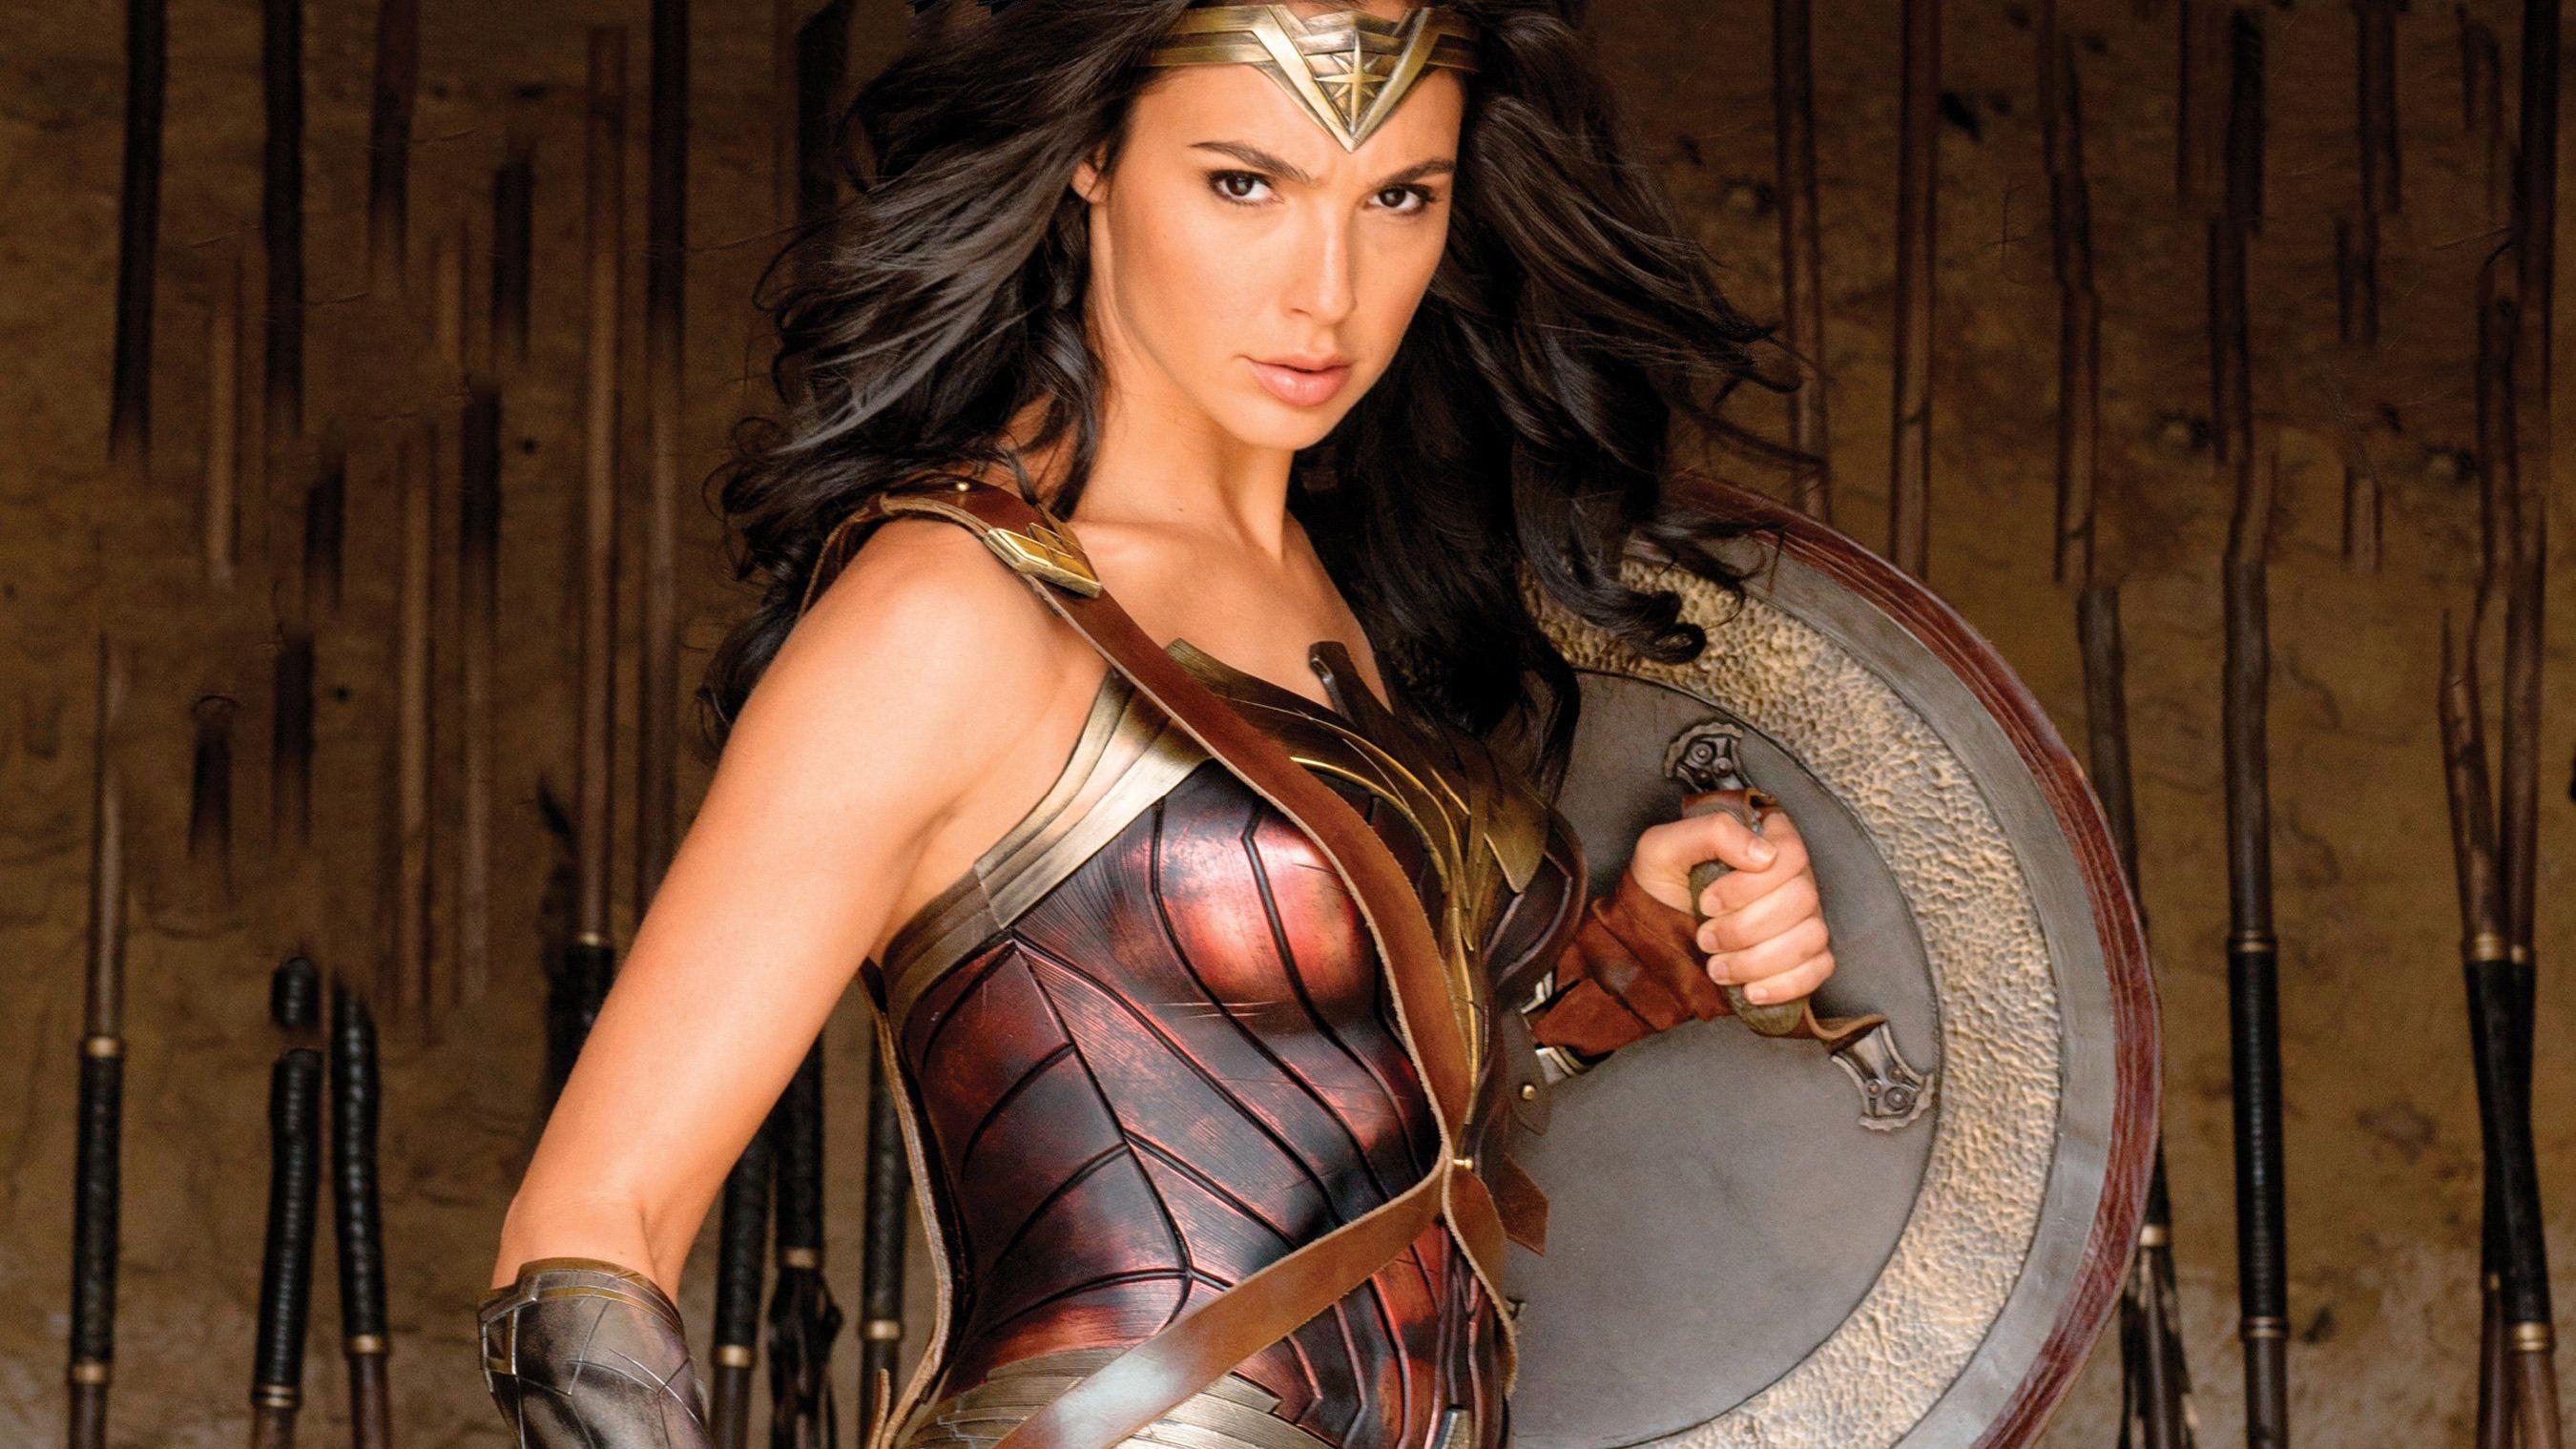 Wallpaper Wonder Woman 4k Movies 11307: Wonder Woman With Shield, HD Movies, 4k Wallpapers, Images